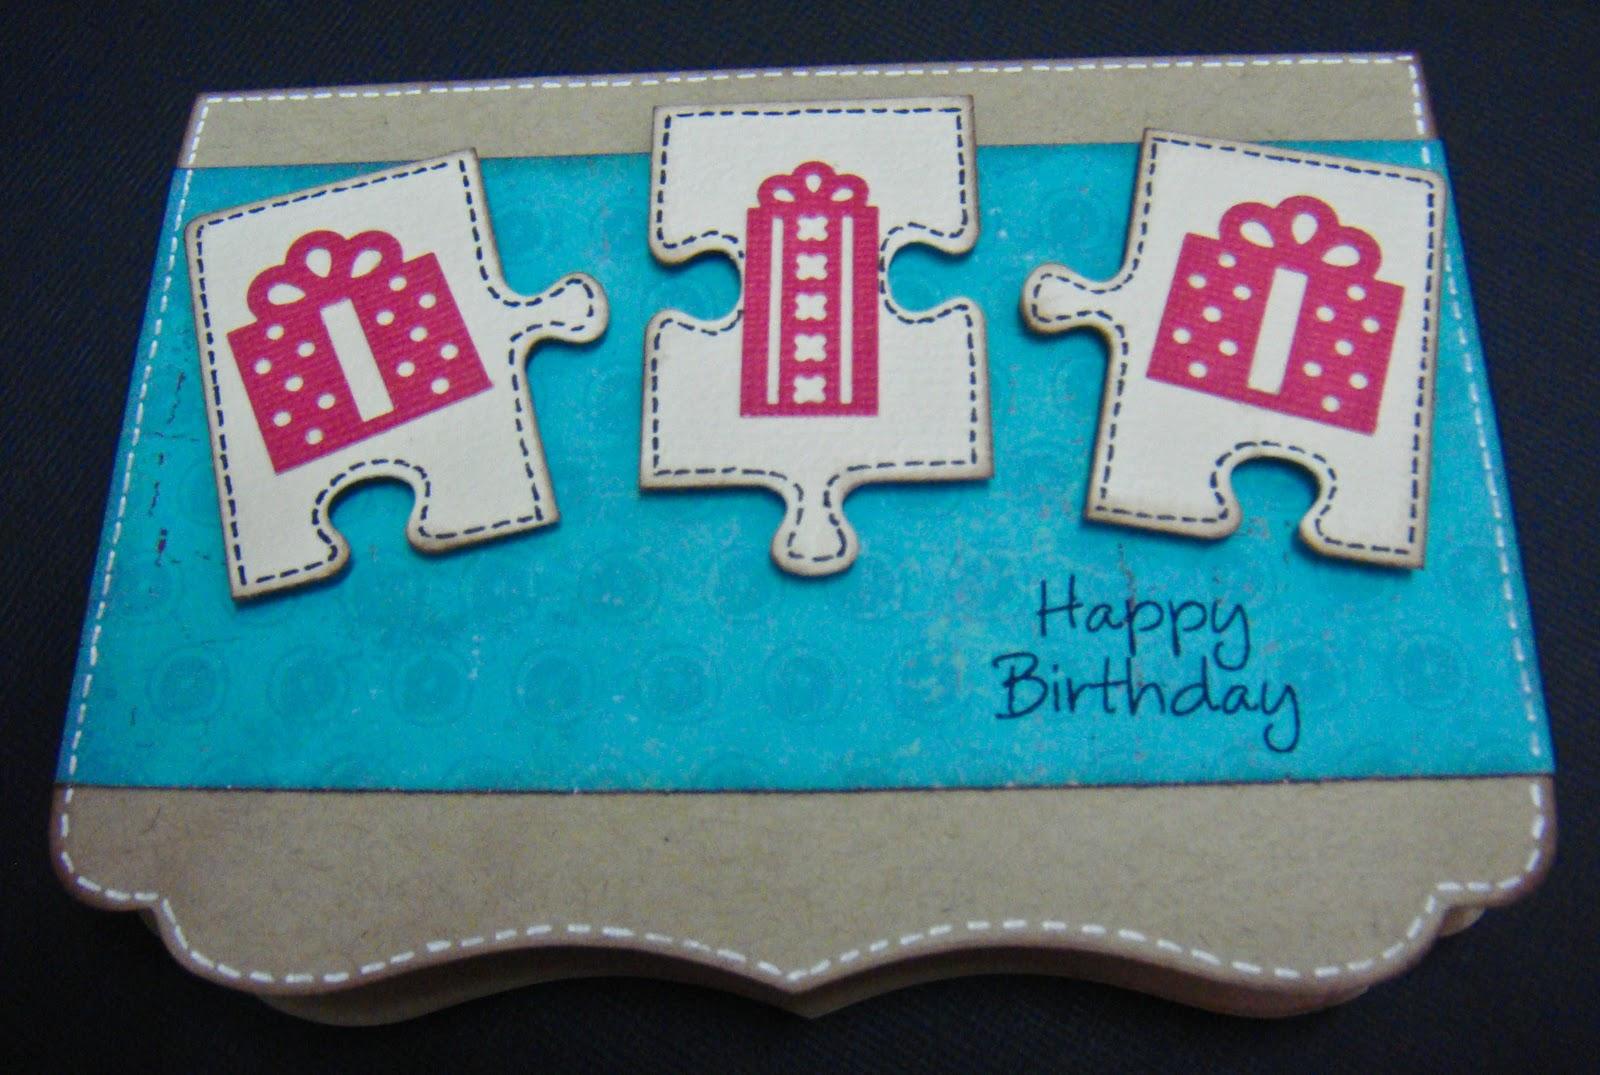 Pasteldaisies Craft Birthday Card For My 9 Yr Old Niece